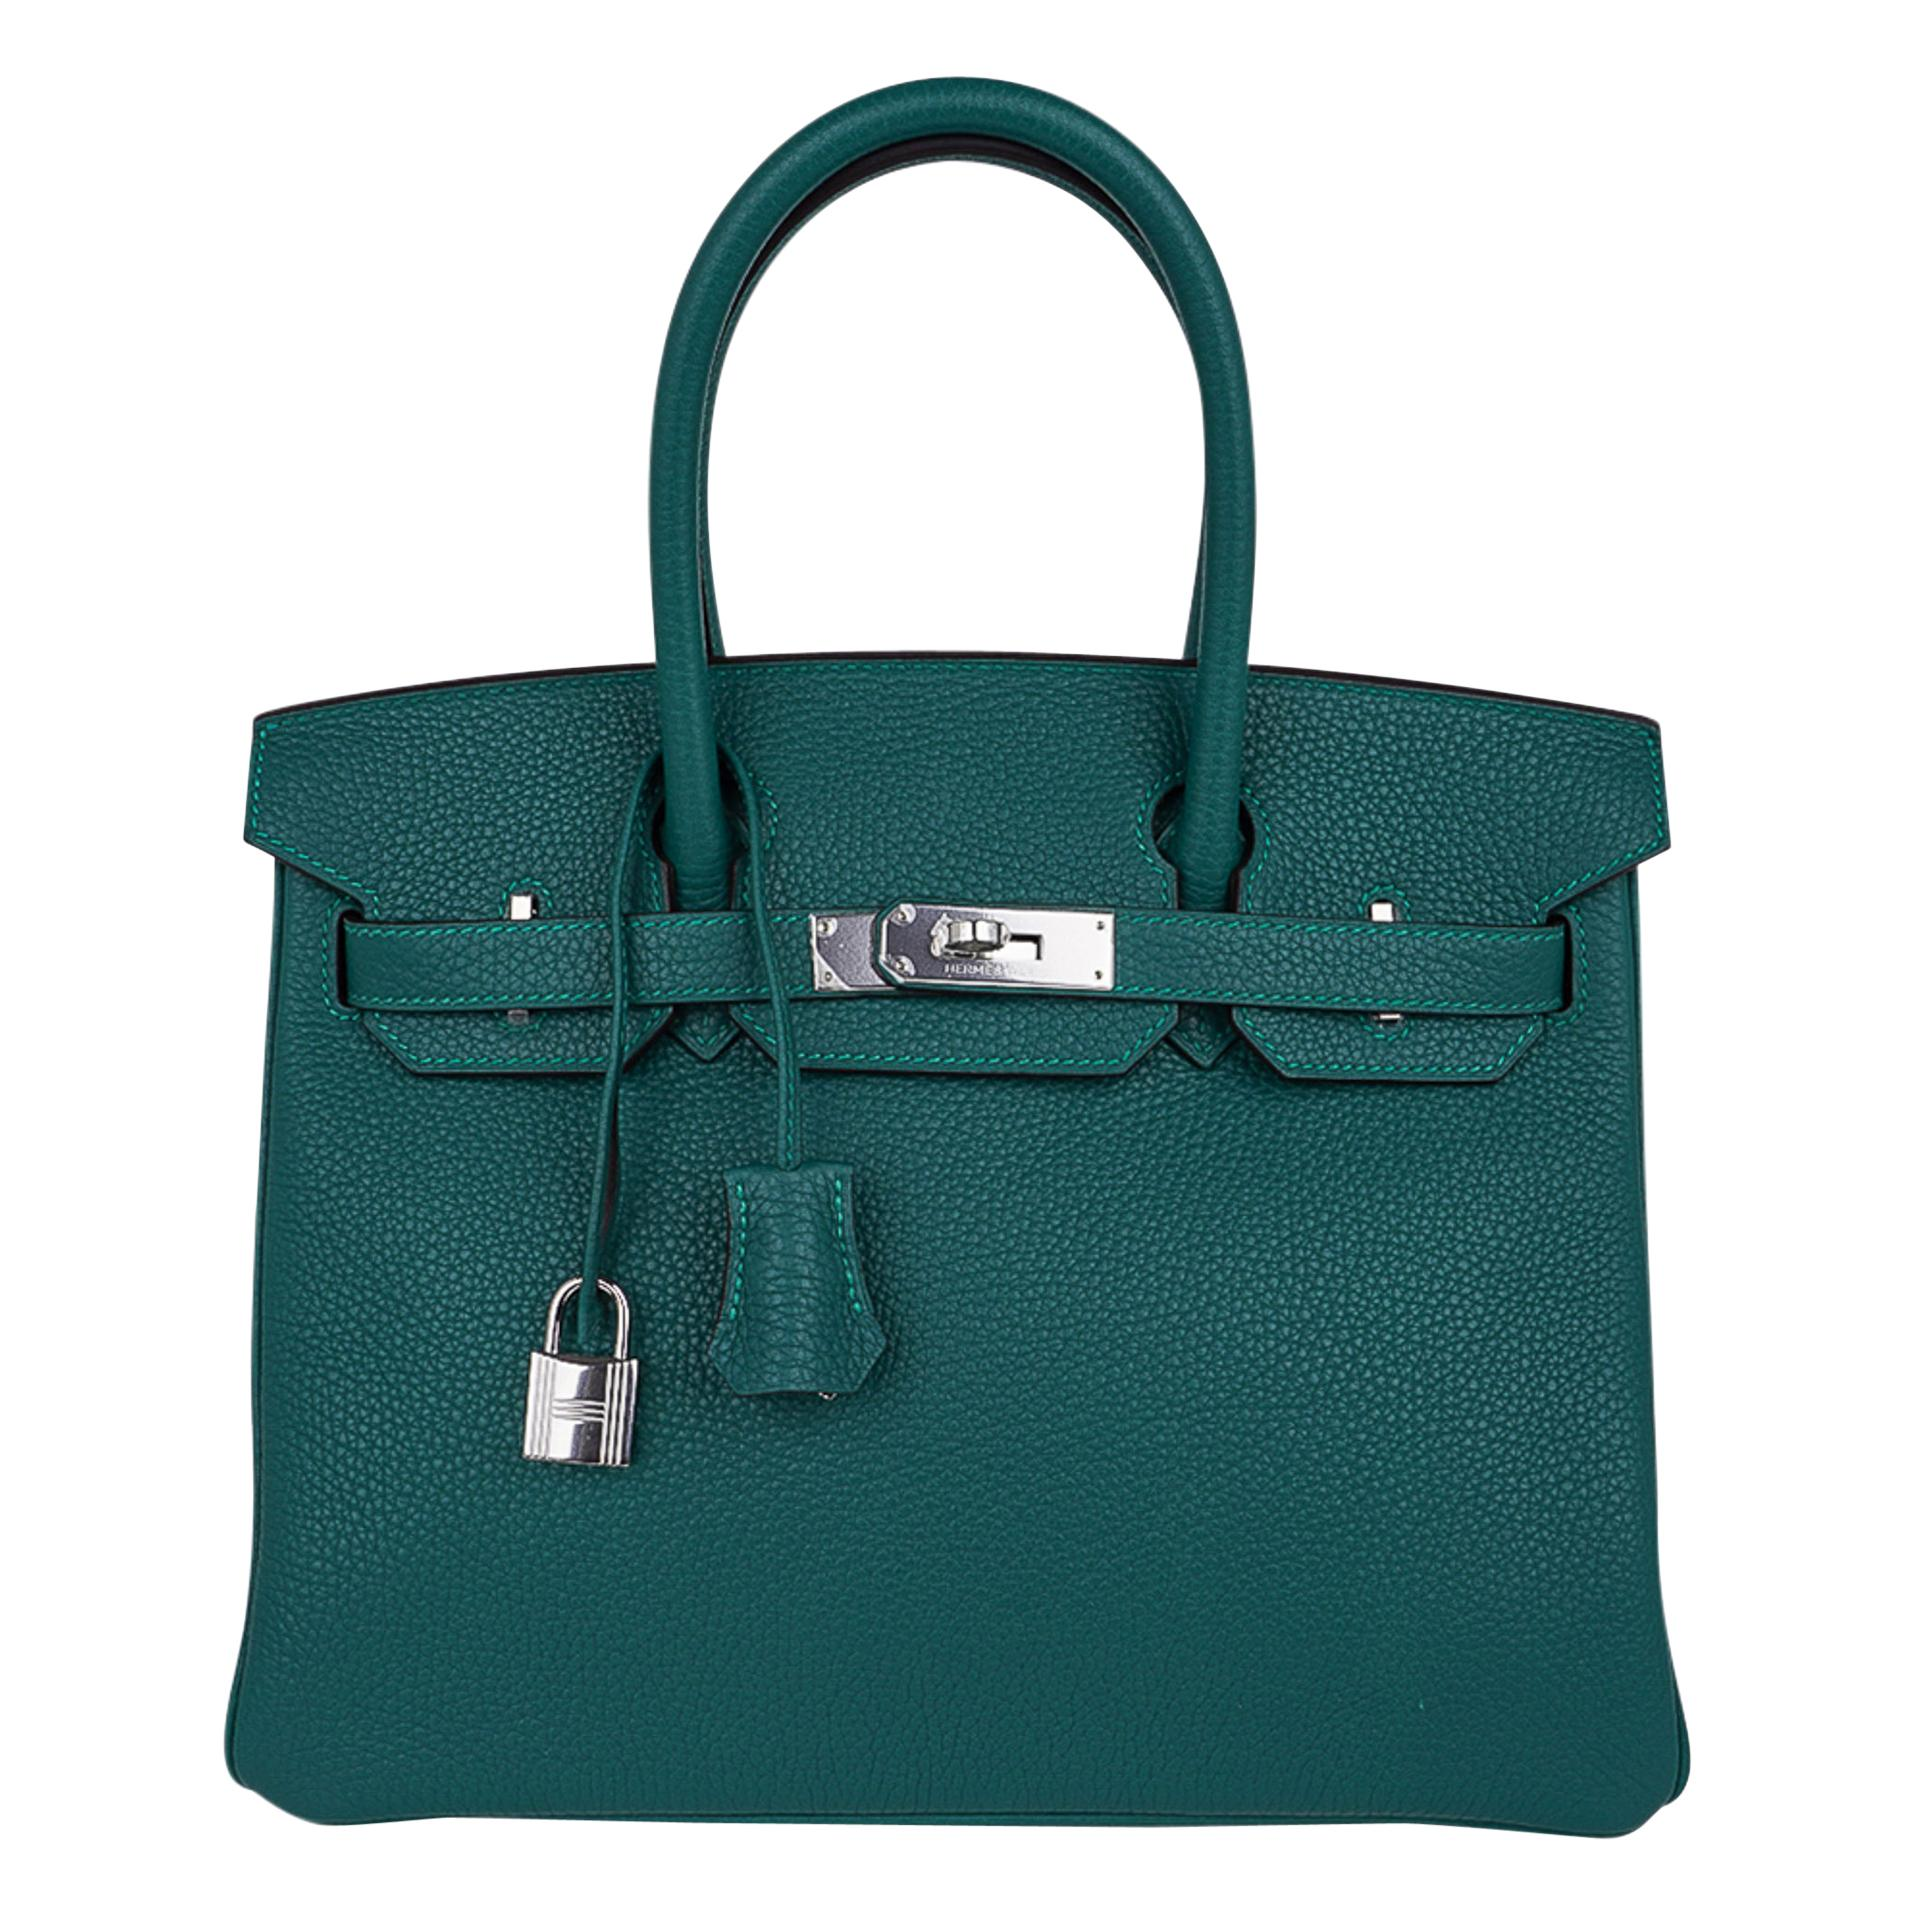 Hermes Birkin 30 Bag Malachite Exotic Emerald Toned Green Clemence Palladium